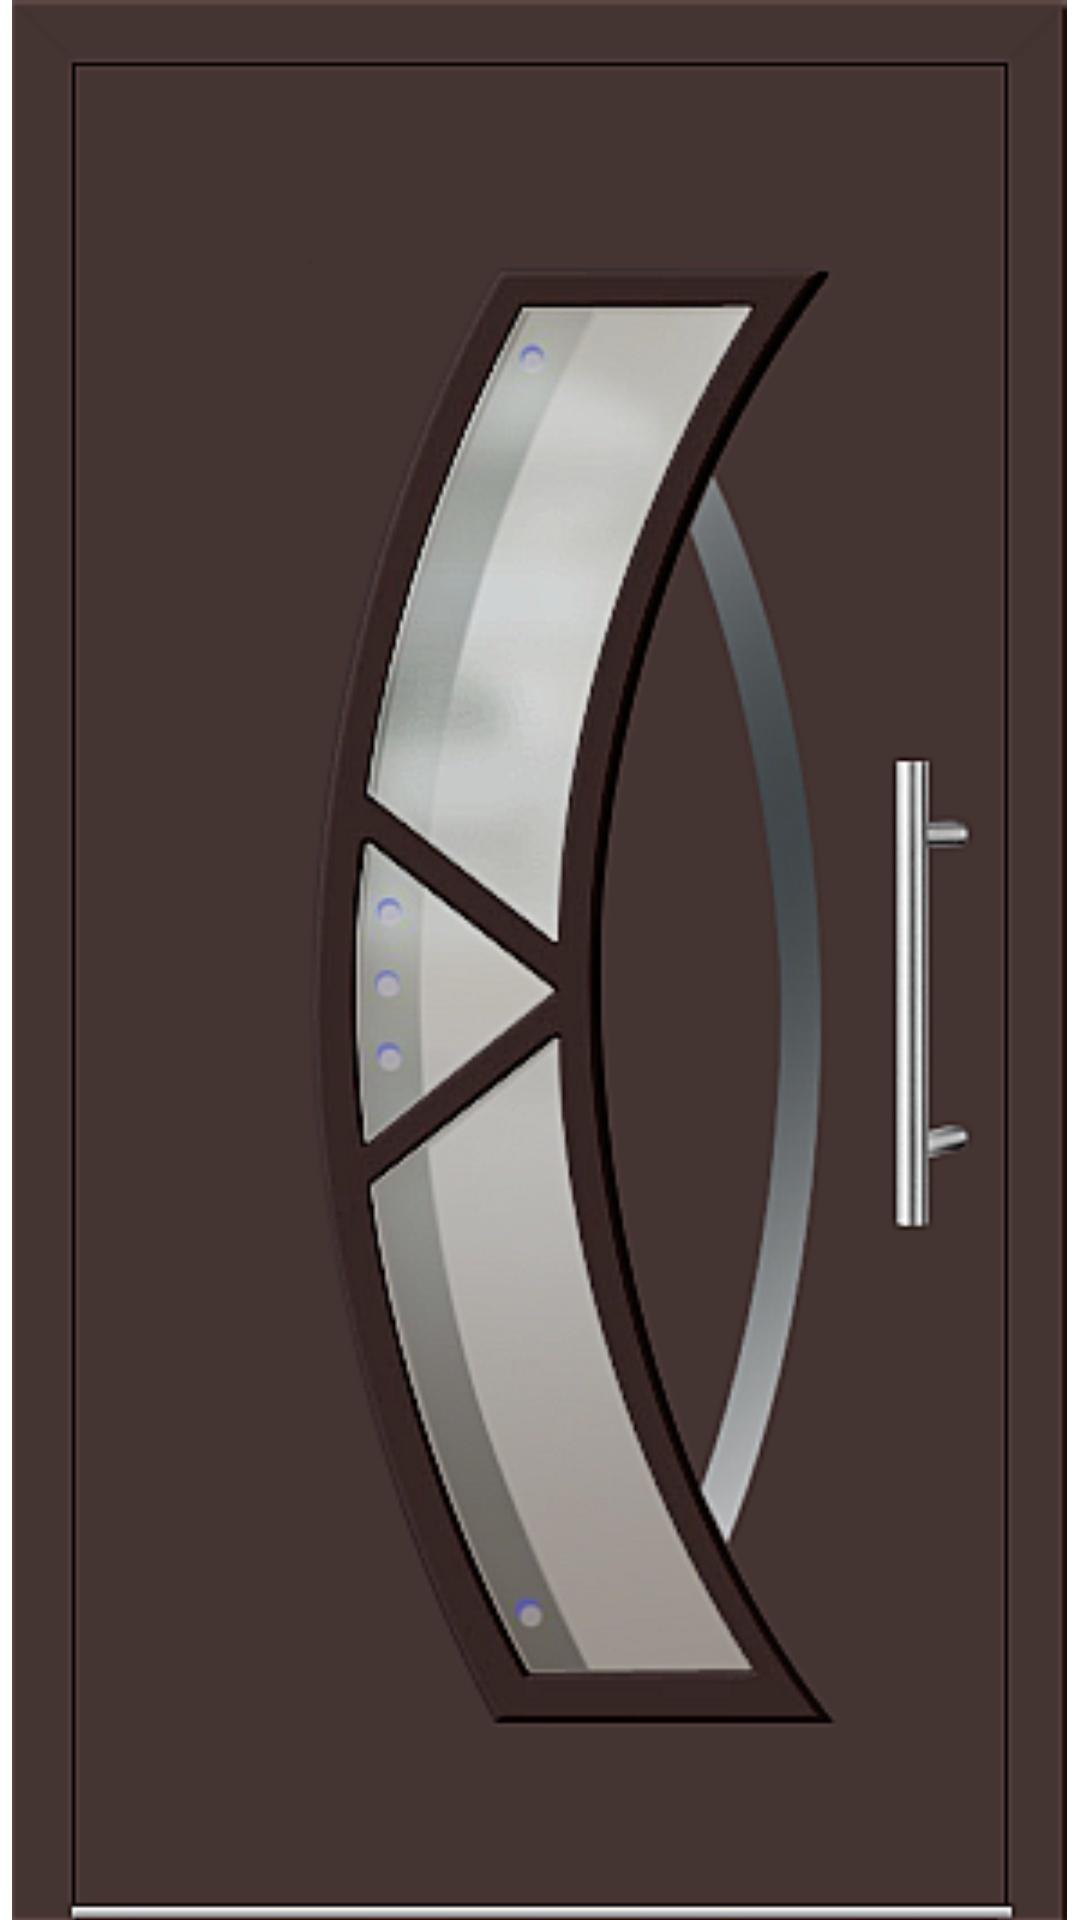 Aluminium Haustür Modell 181-67 mahagonibraun